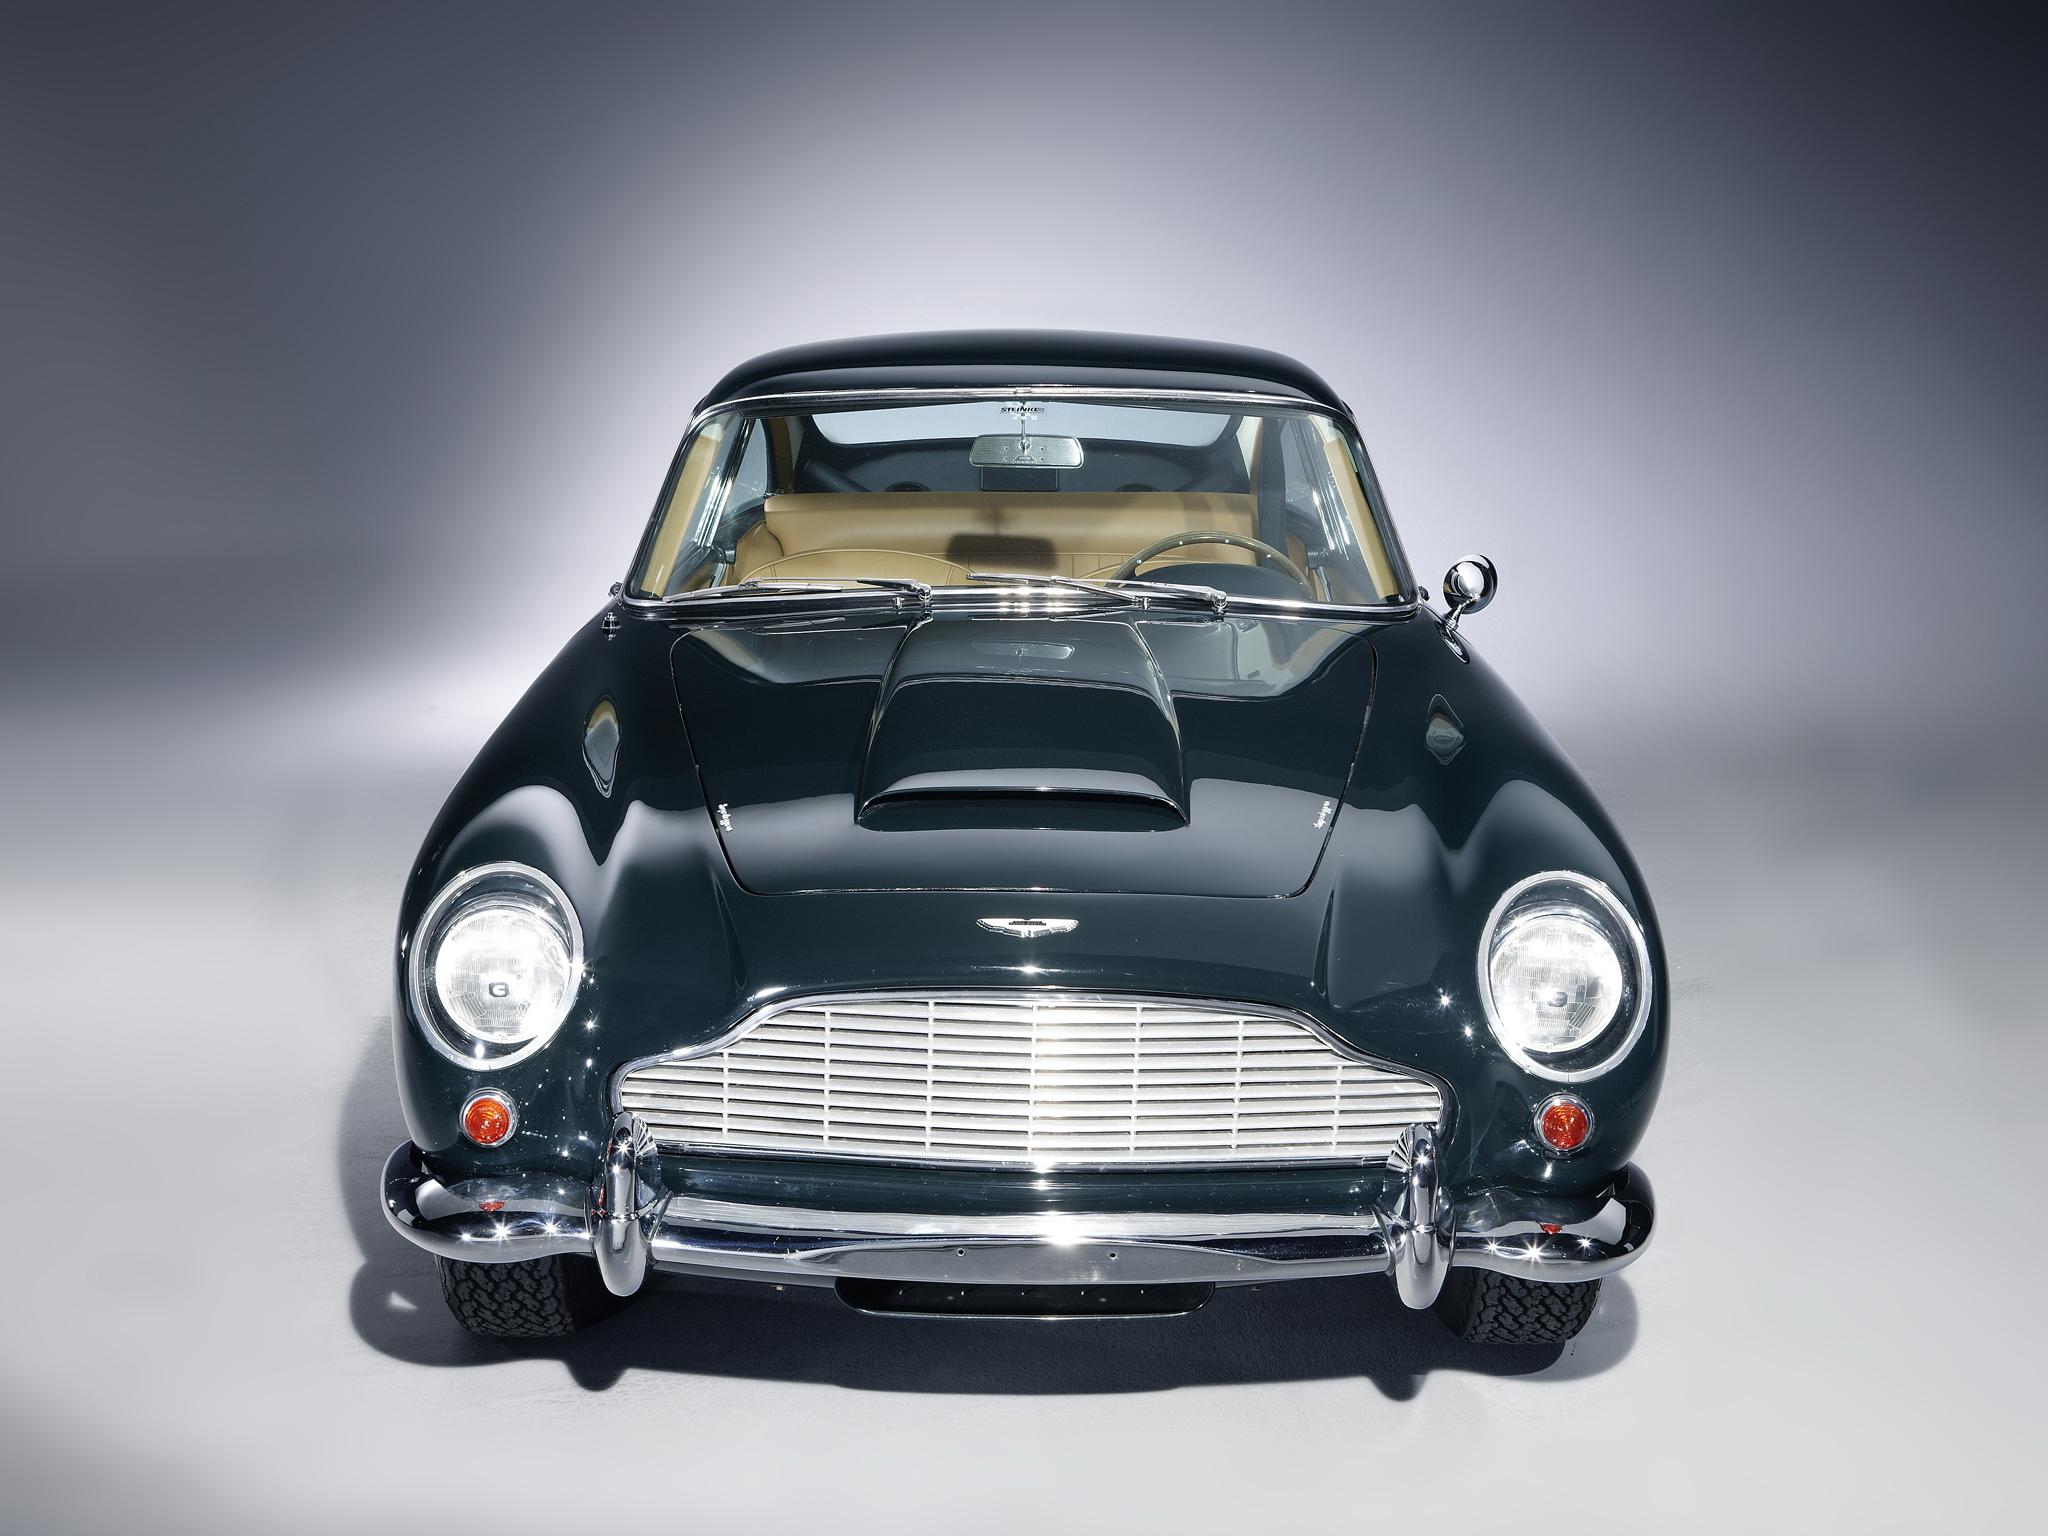 Aston Martin DB5 Vantage Wallpapers Car wallpapers HD 2048x1536